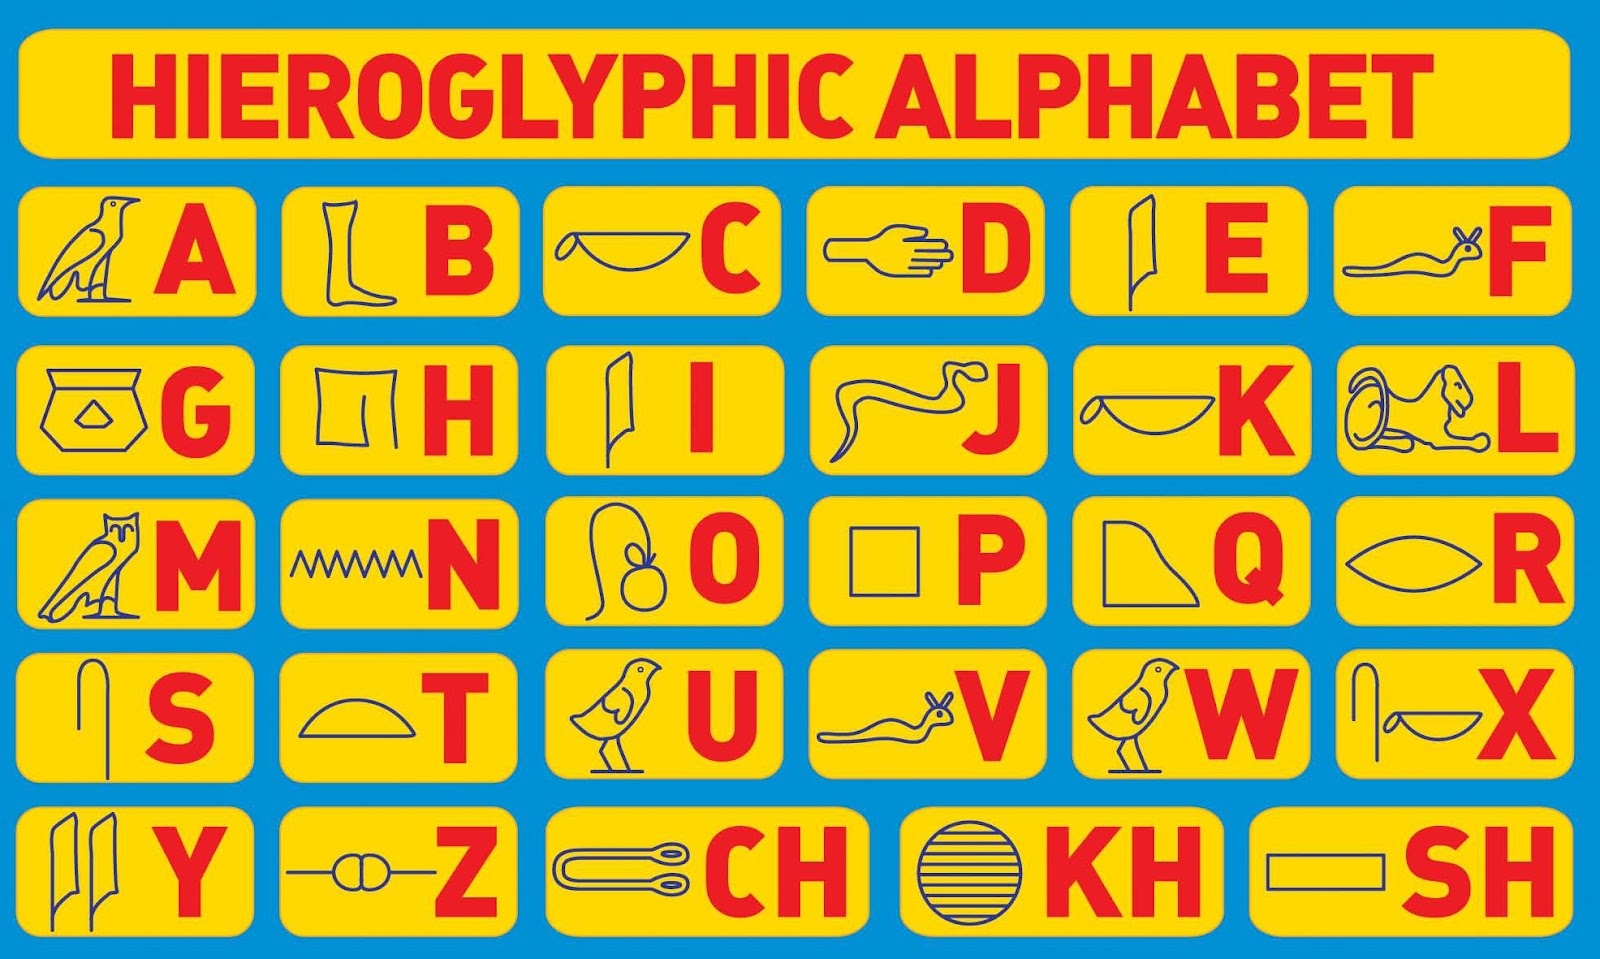 Egyptian Hieroglyphics alphabet chart, emoji history